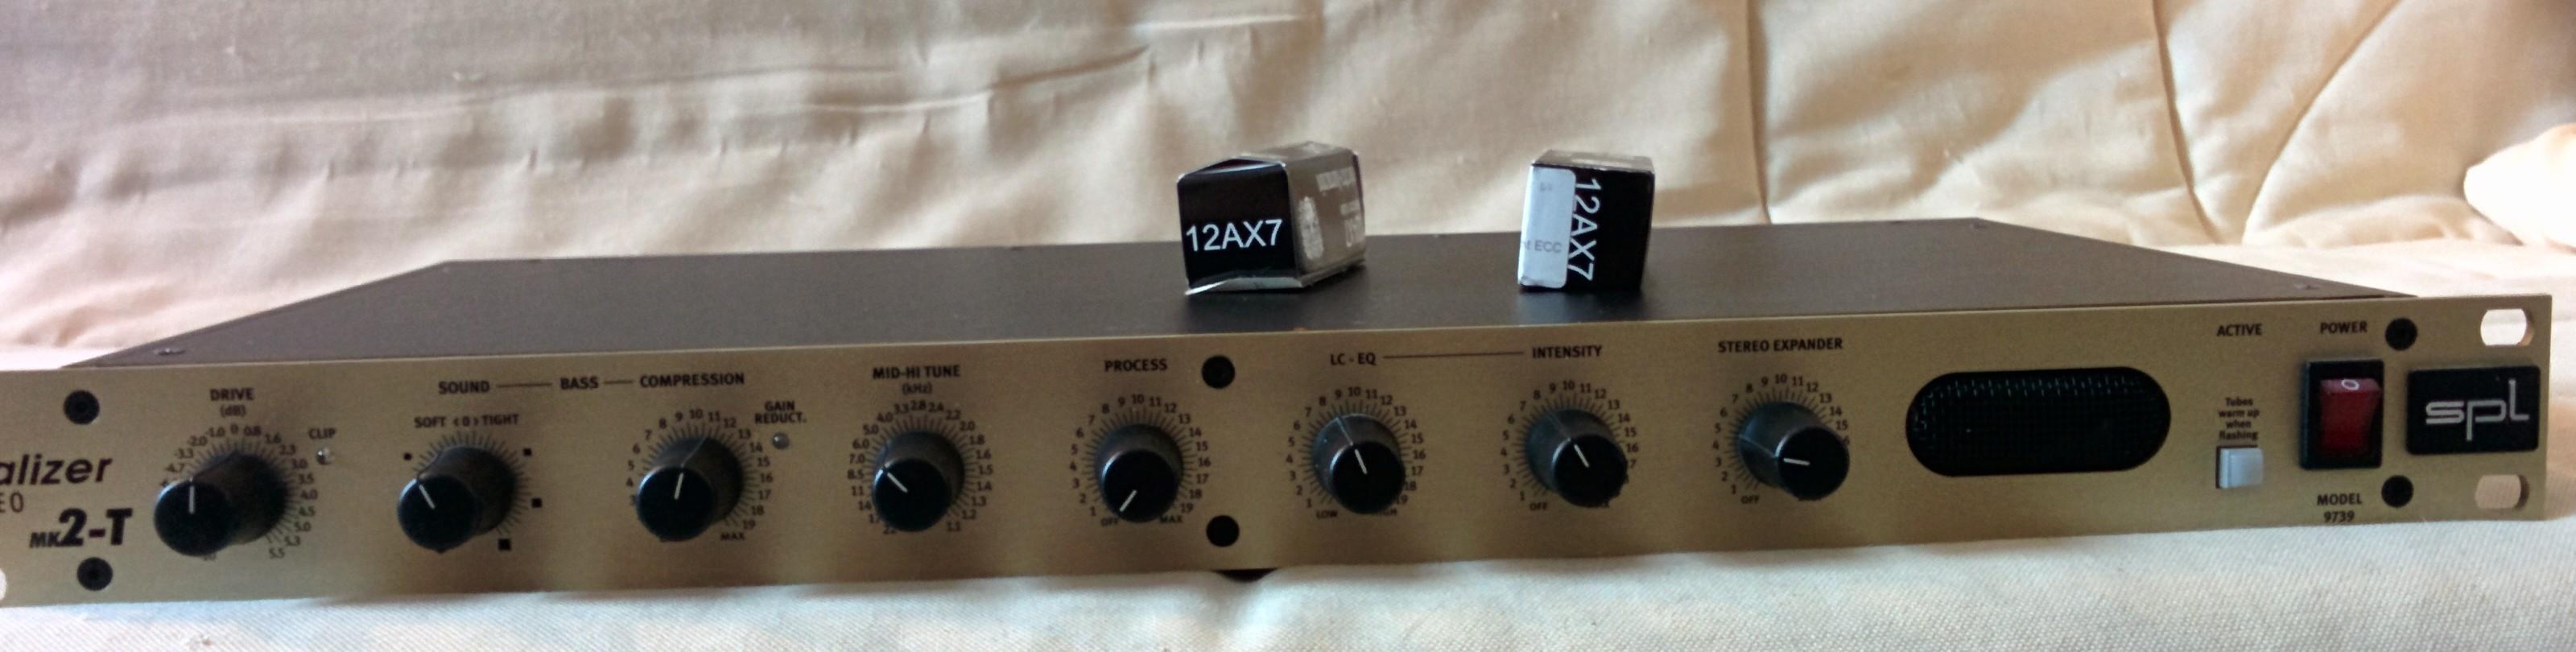 spl stereo vitalizer mk2 t image 1019648 audiofanzine rh en audiofanzine com Vitalizer BioPhotonic spl stereo vitalizer mk2-t manual